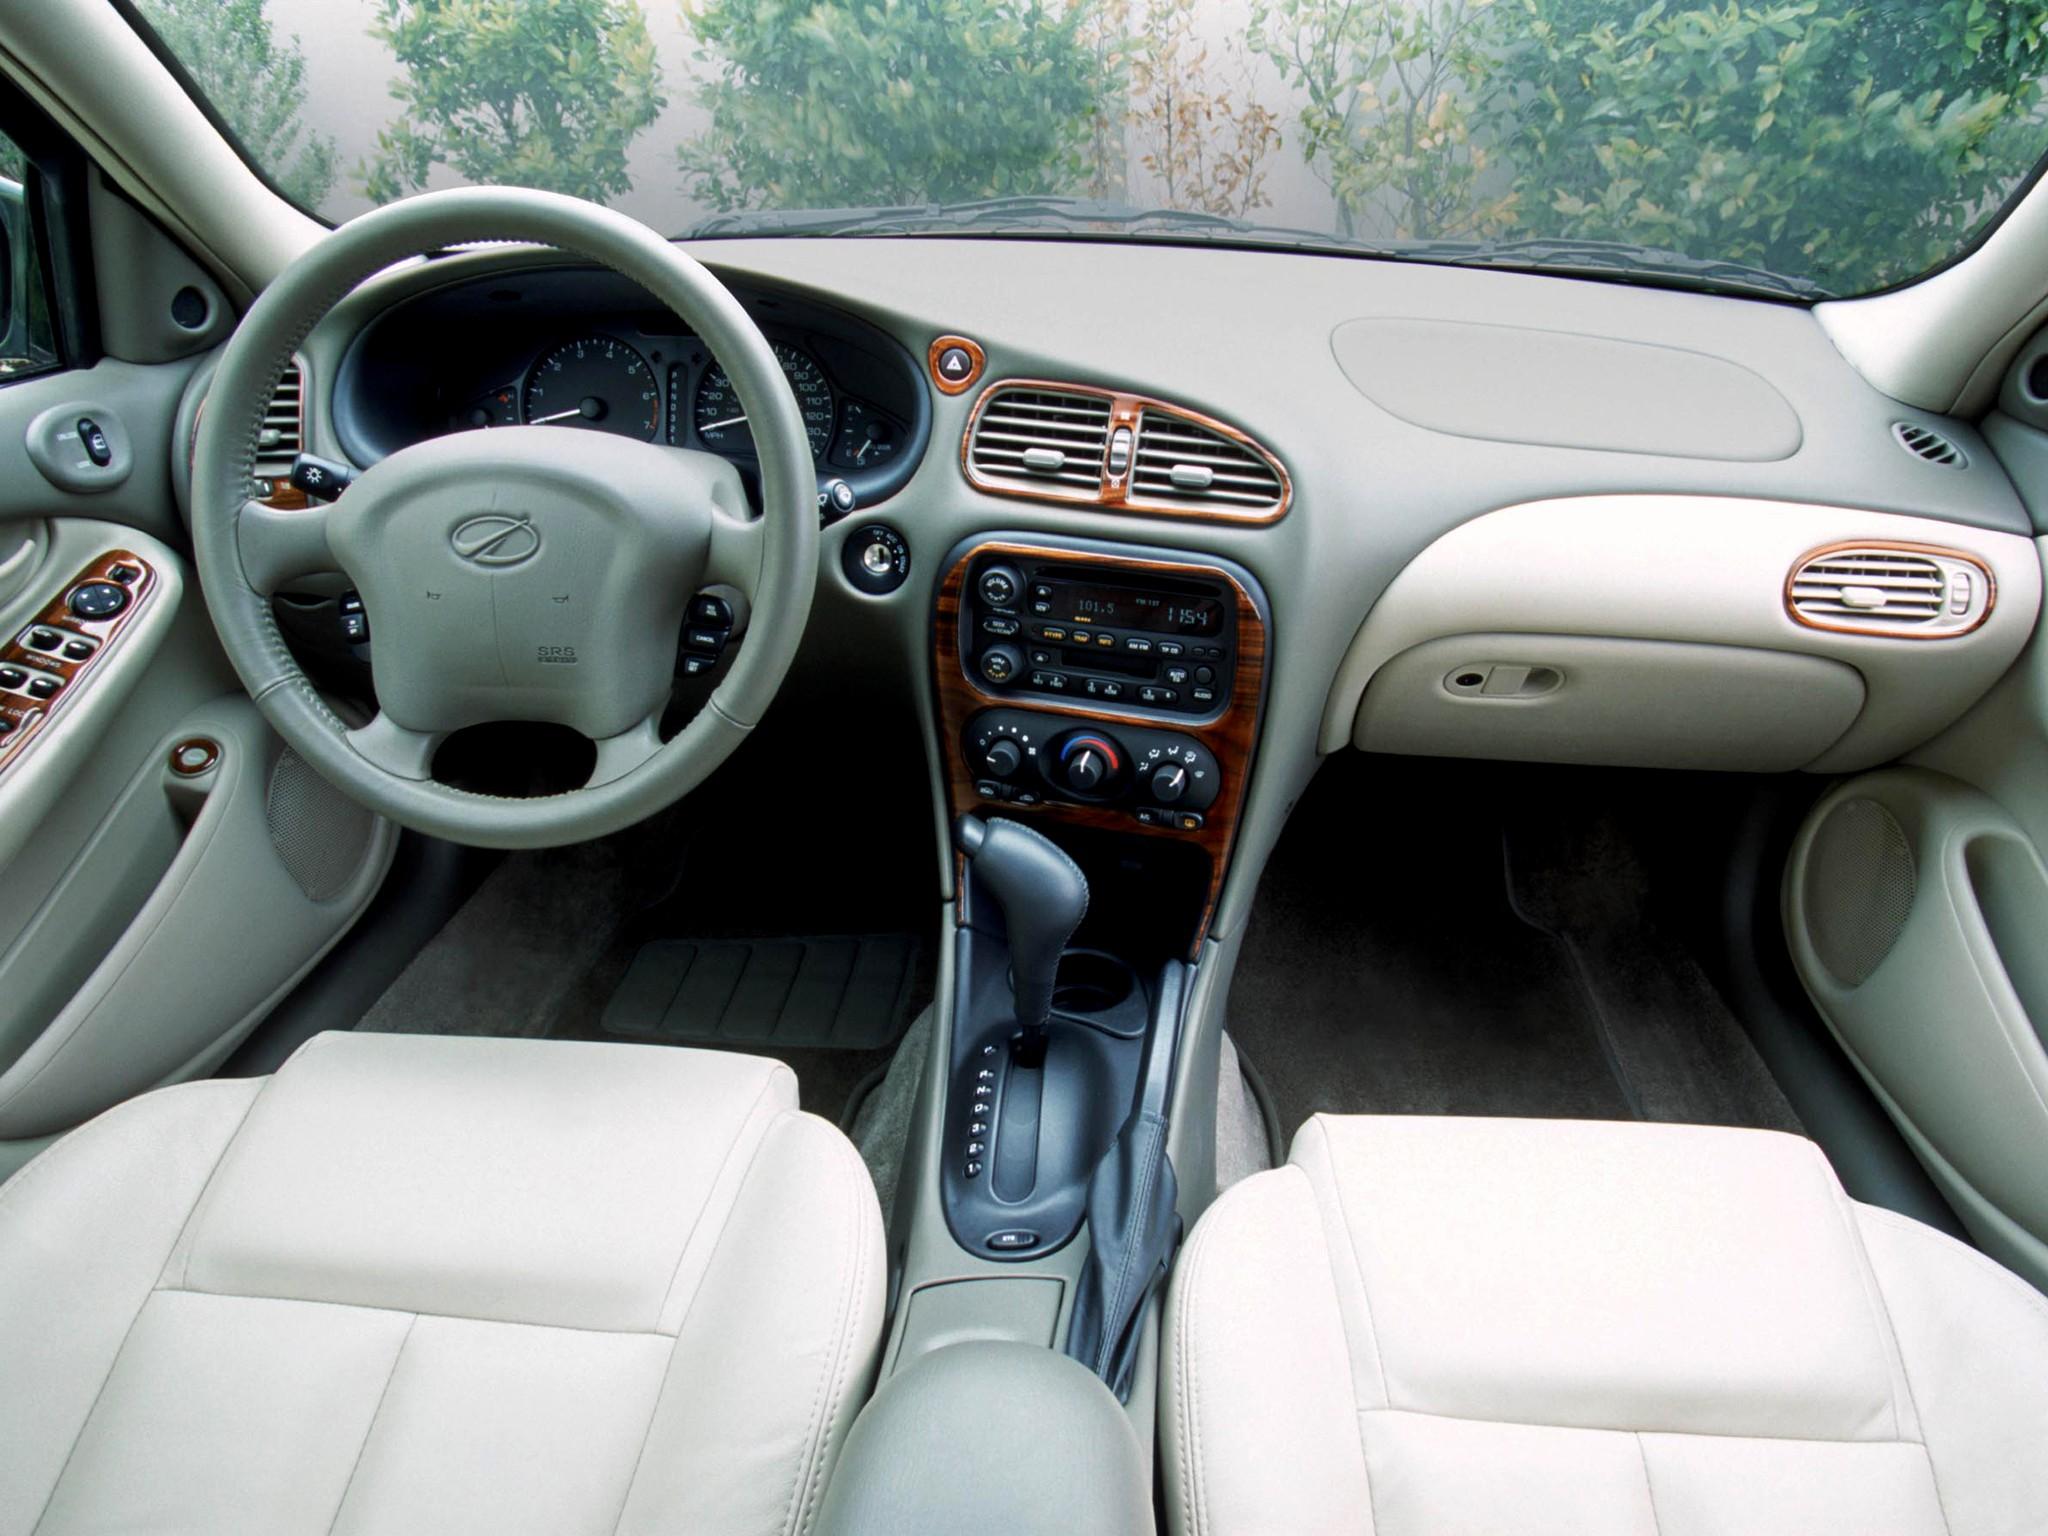 Oldsmobile Alero Coupe on 2000 Oldsmobile Alero